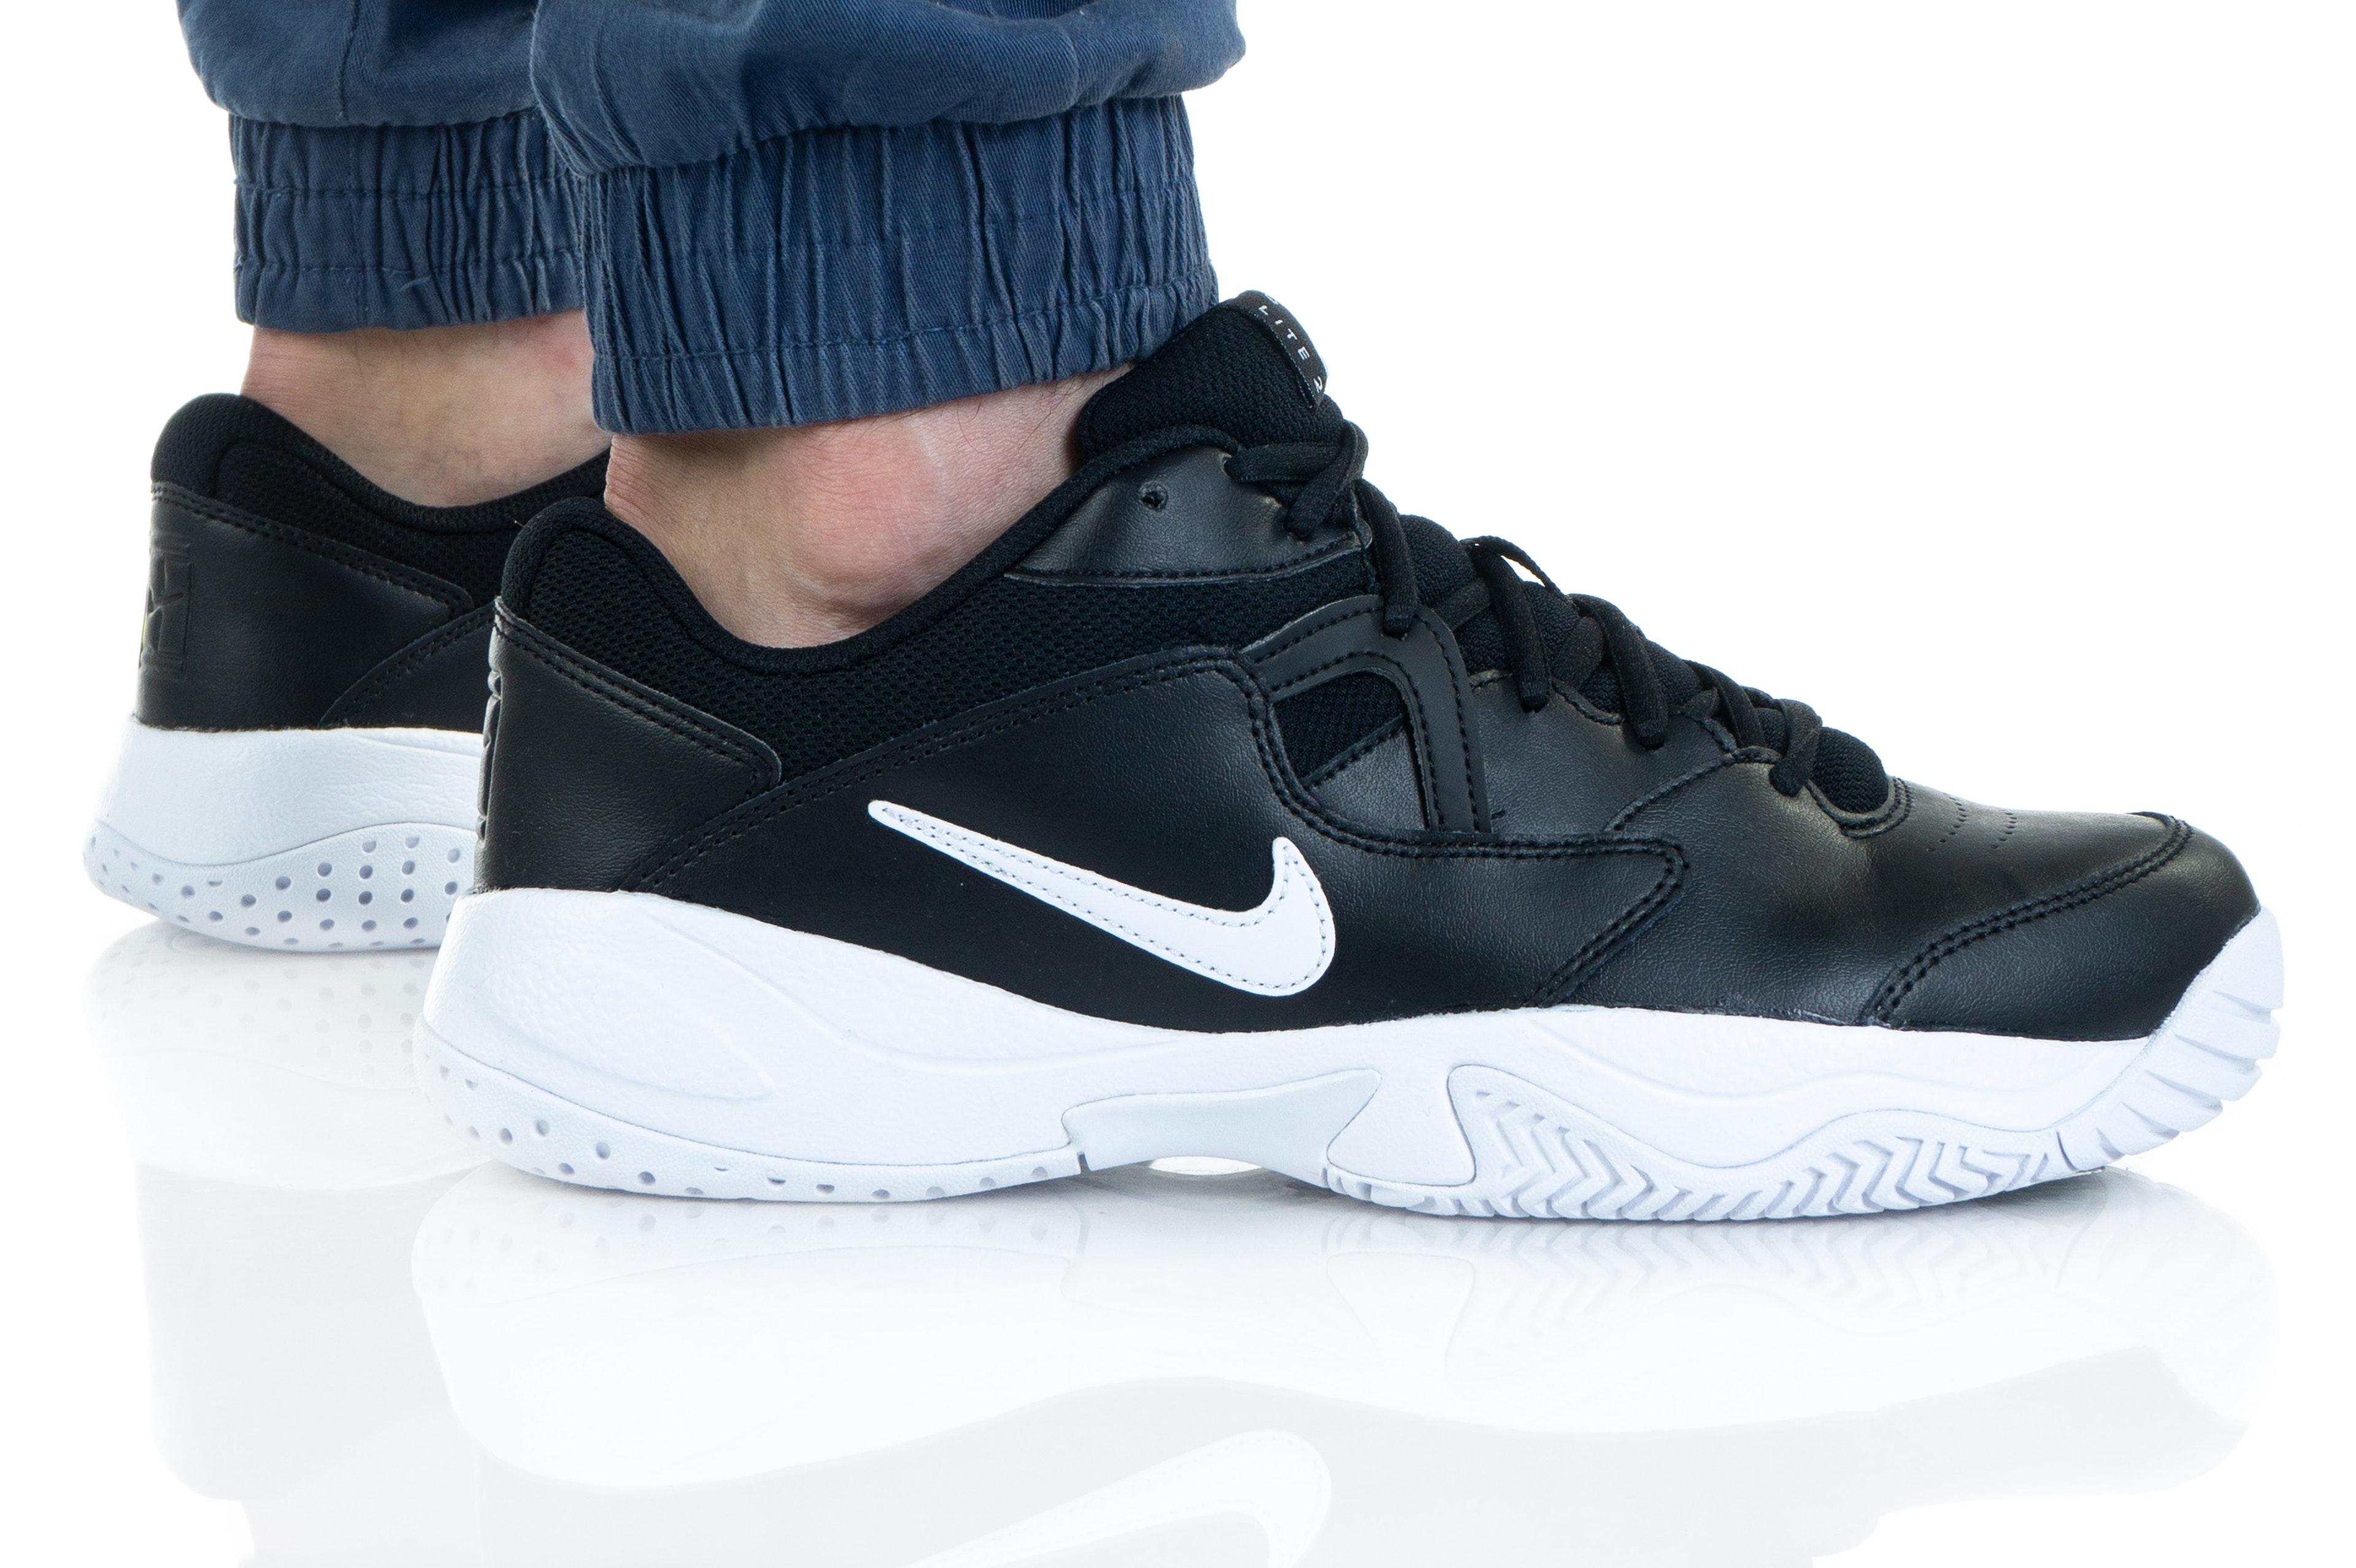 Nike COURT LITE 2 AR8836-005